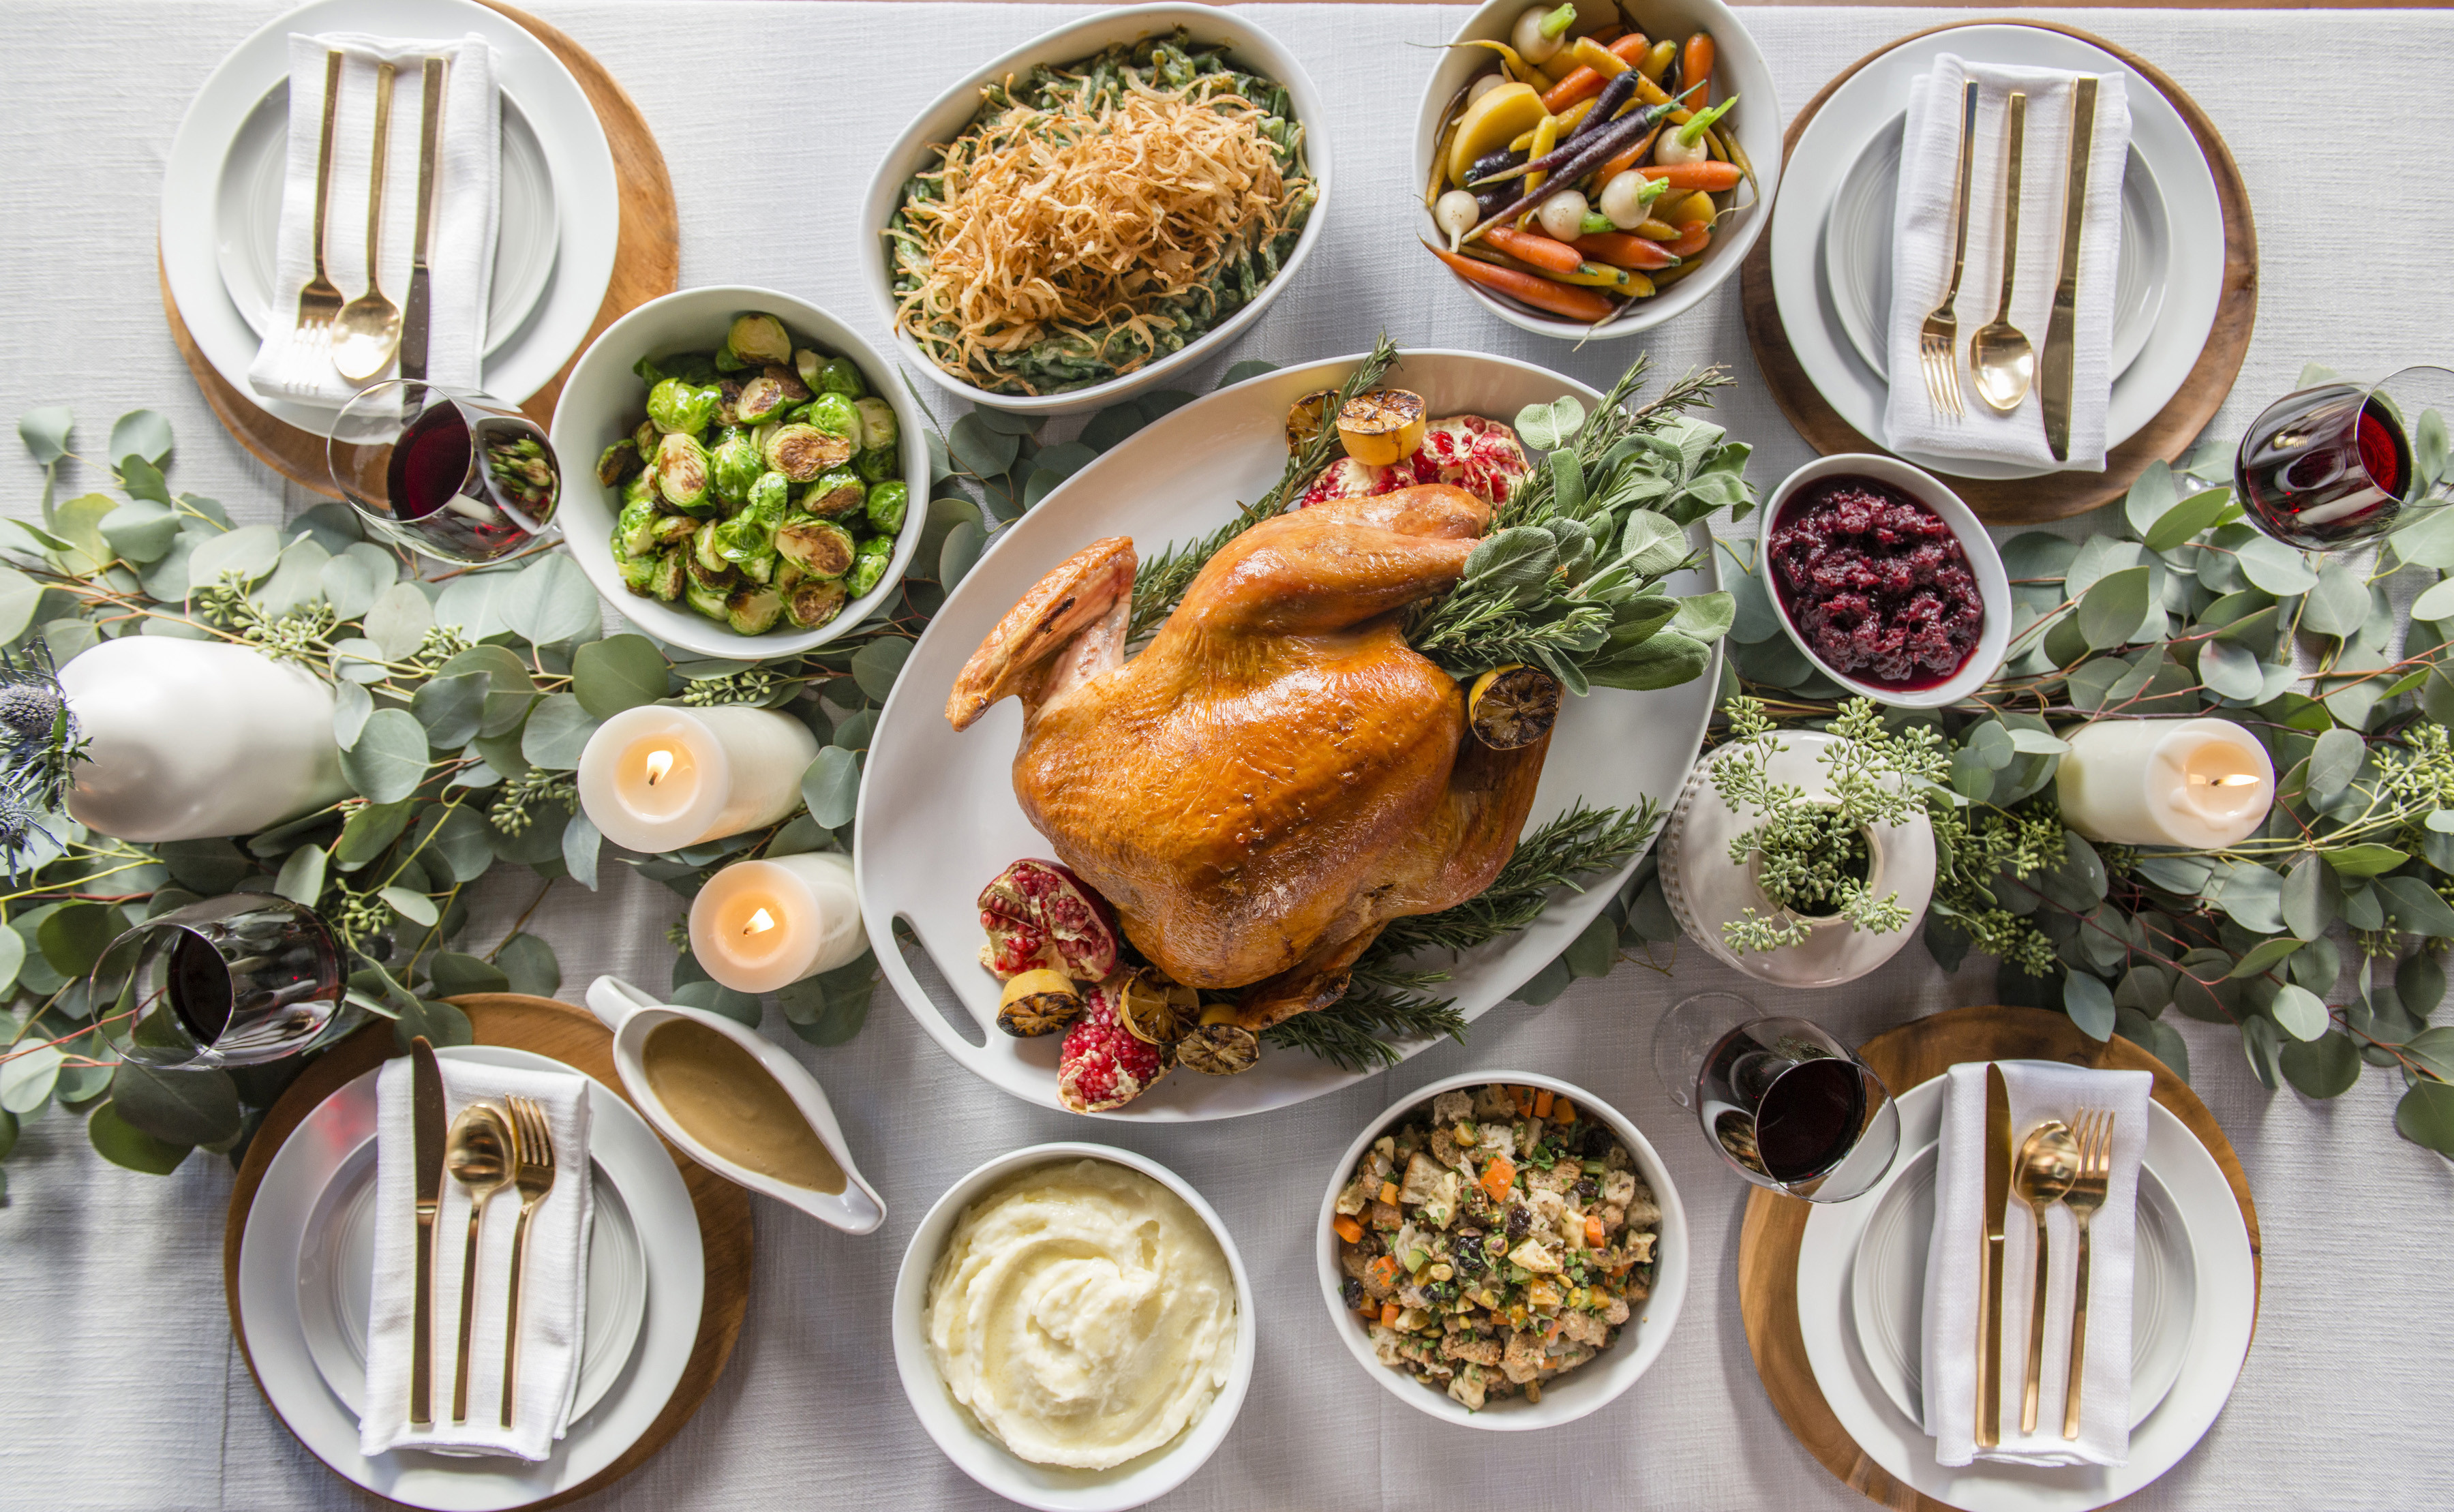 Turkey Dinner To Go  THANKSGIVING DINNER TO GO Sapphire Laguna